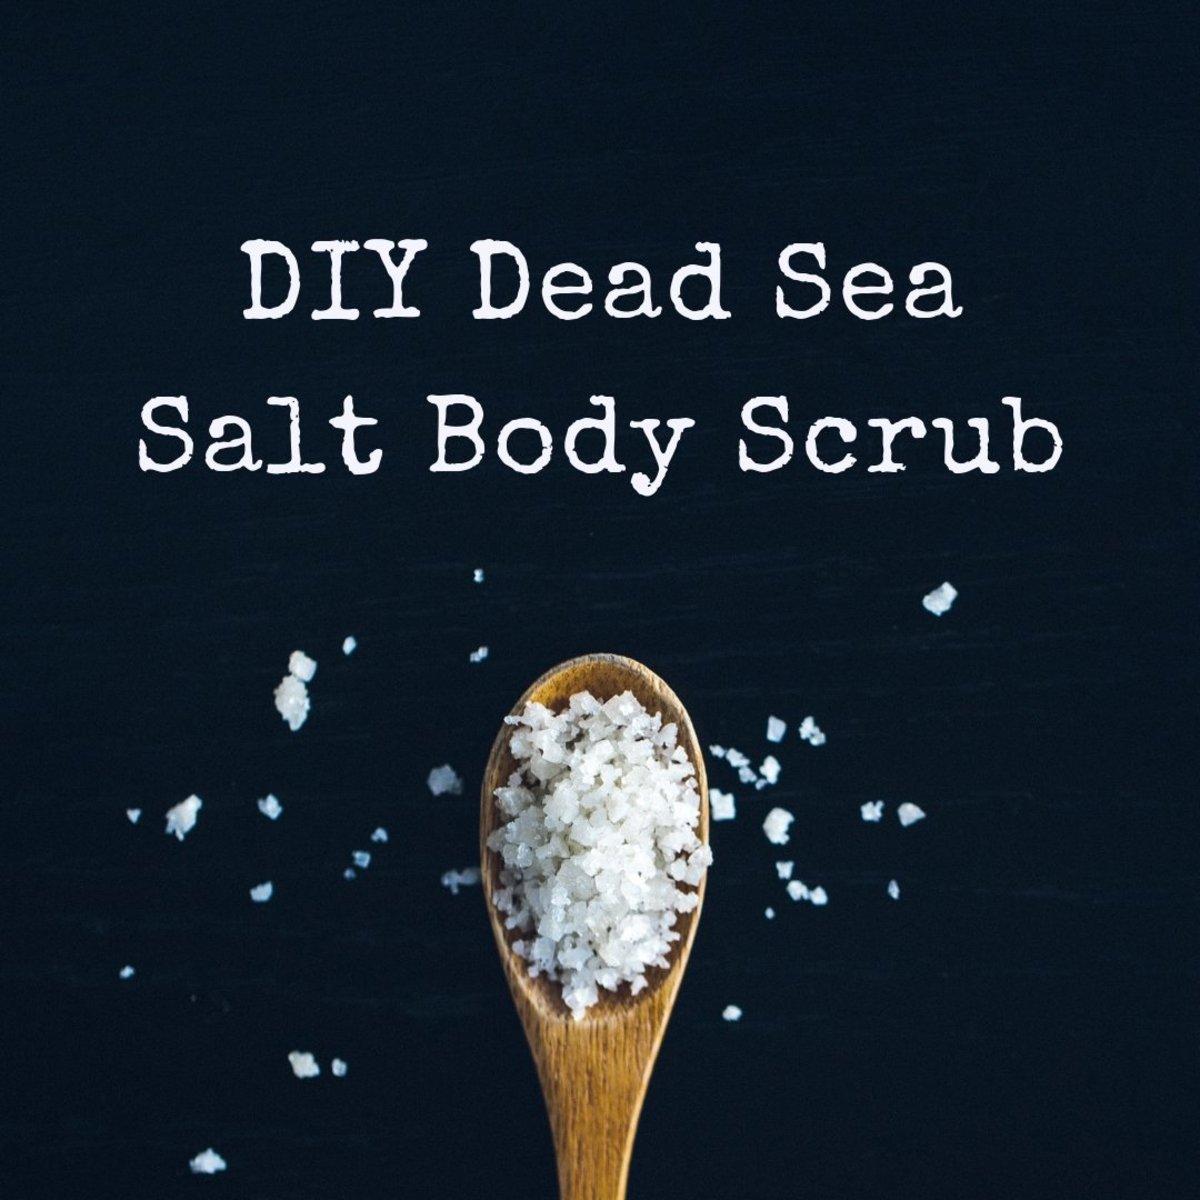 How to Make Your Own Dead Sea Salt Body Scrub